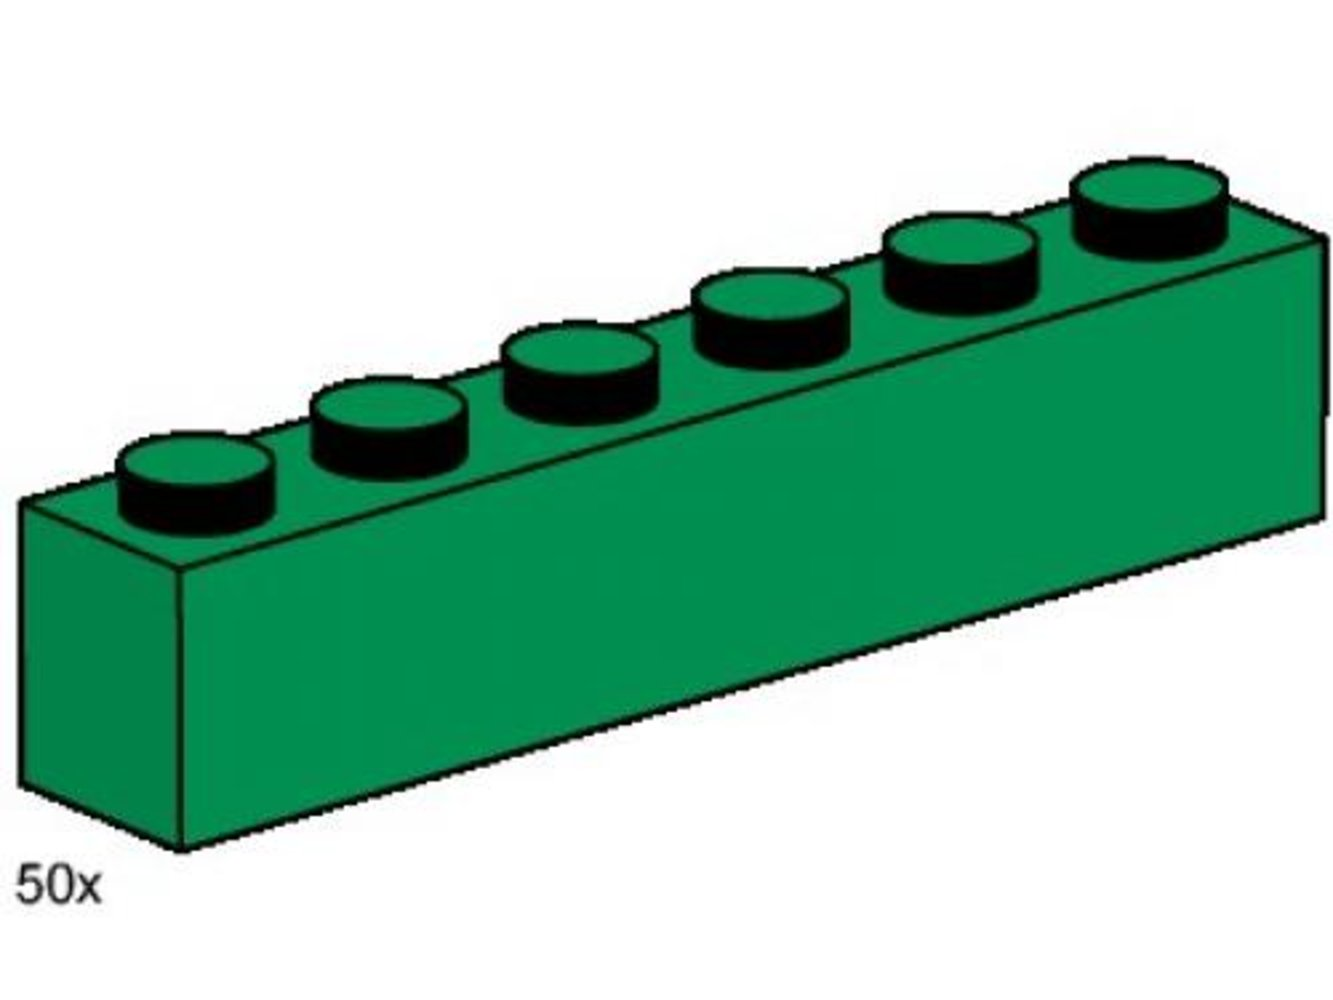 1 x 6 Dark Green Bricks